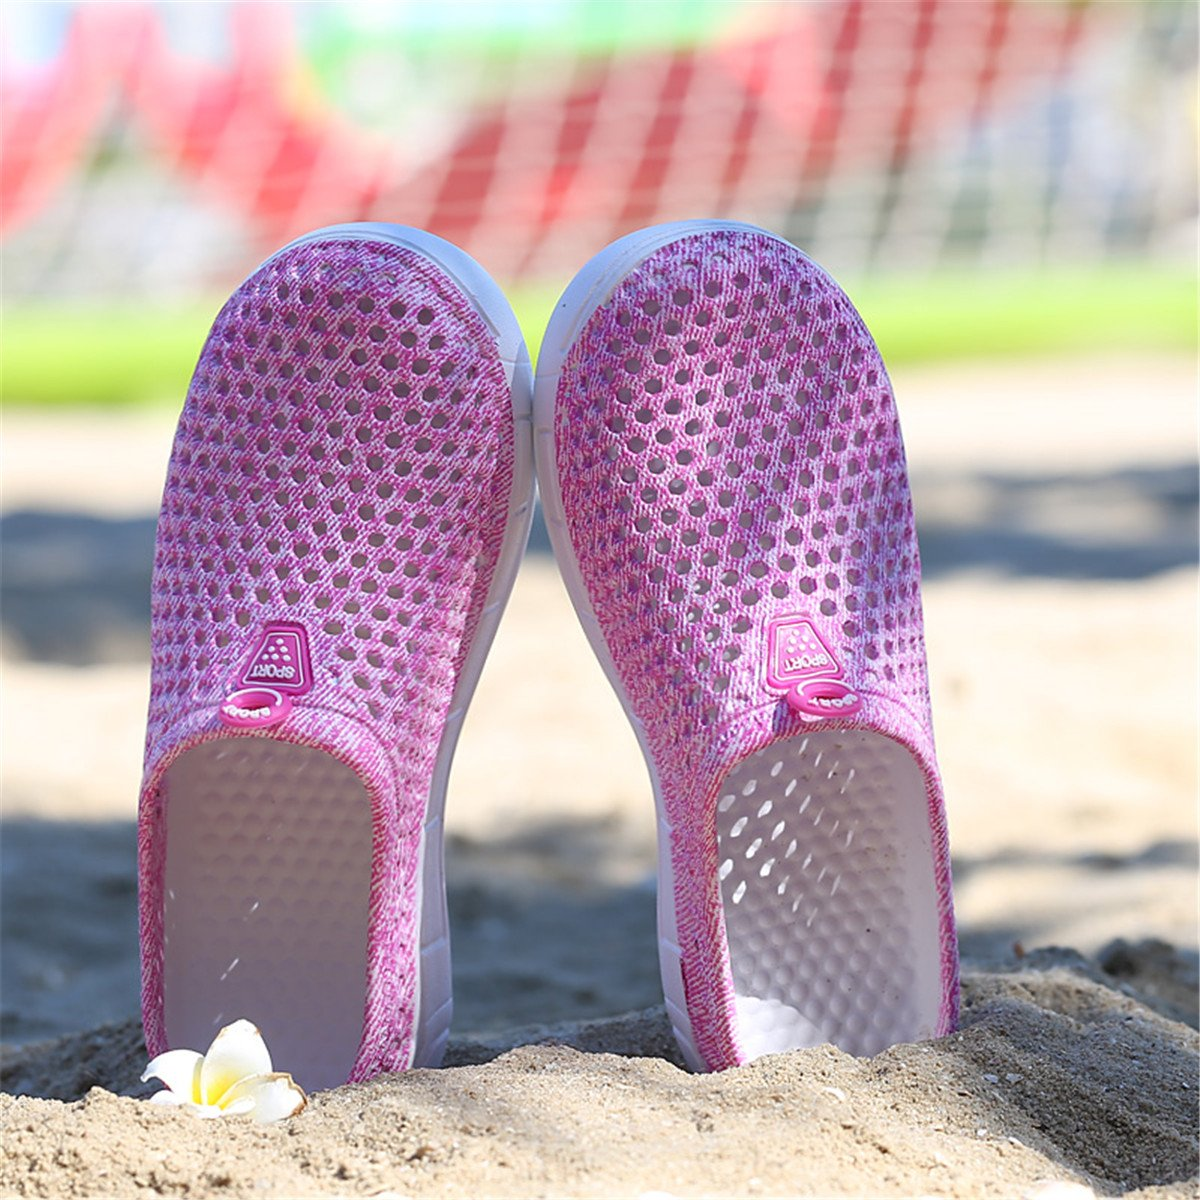 Ginjang Women's Garden Clogs Shoes Slip-on Slippers Sandals(39/Pink) by Ginjang (Image #5)